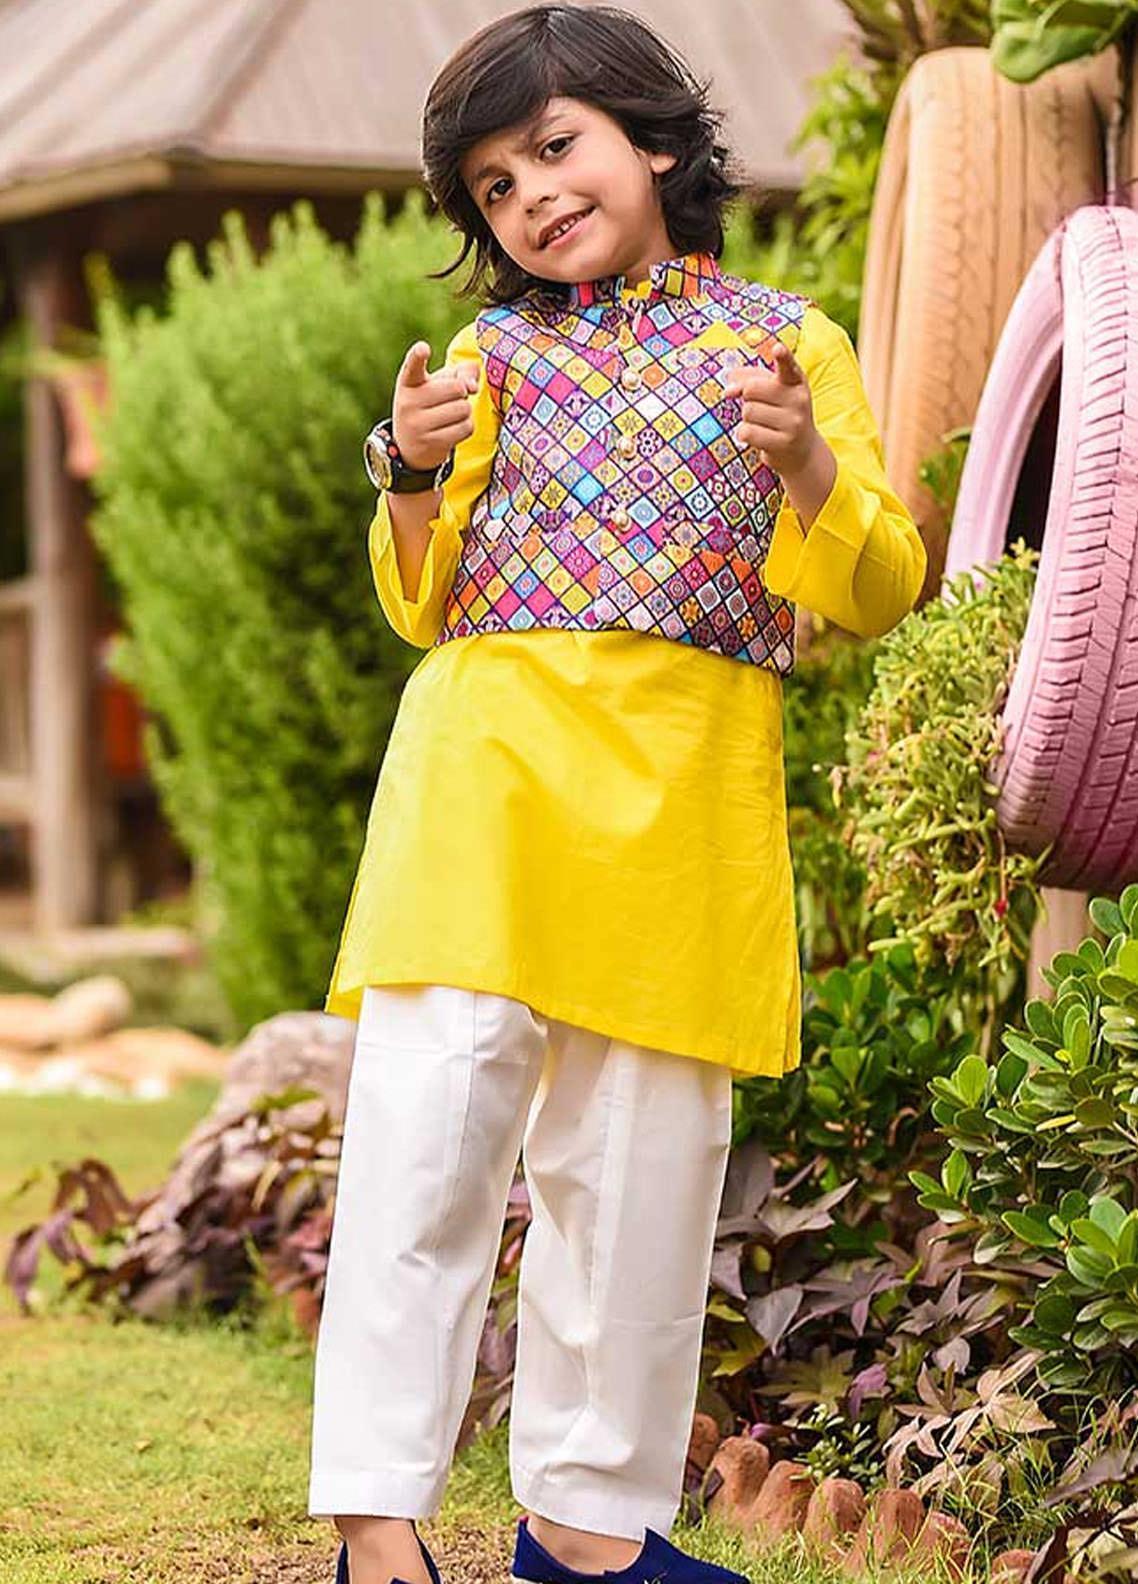 Ochre Cotton Formal Kurta Shalwar with Waistcoat for Boys -  OBK-09 Yellow